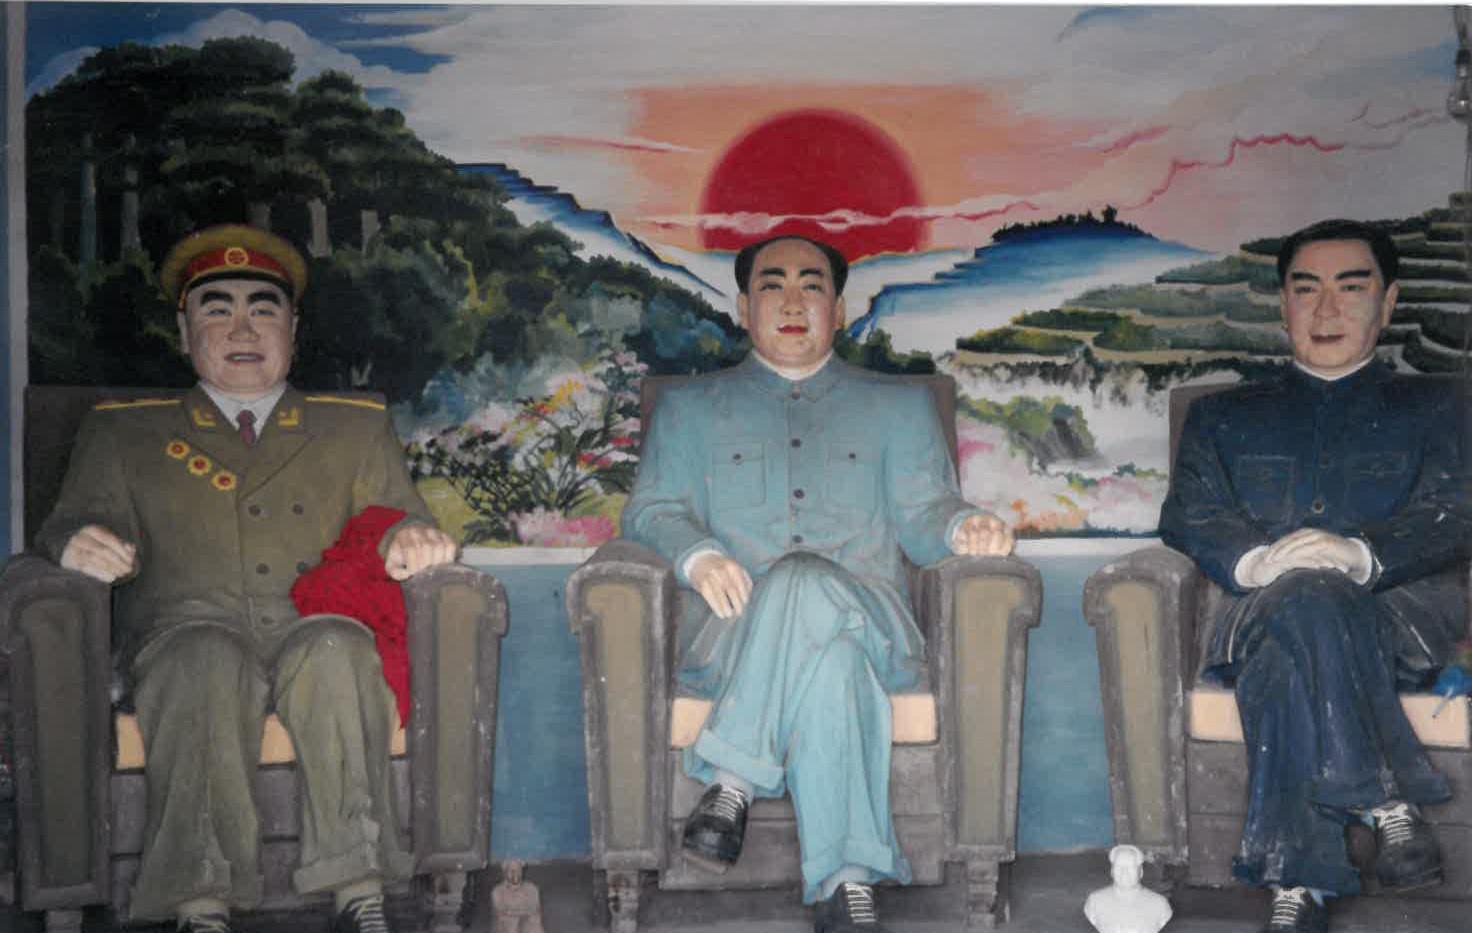 Mao Zedong Temple 8.jpg